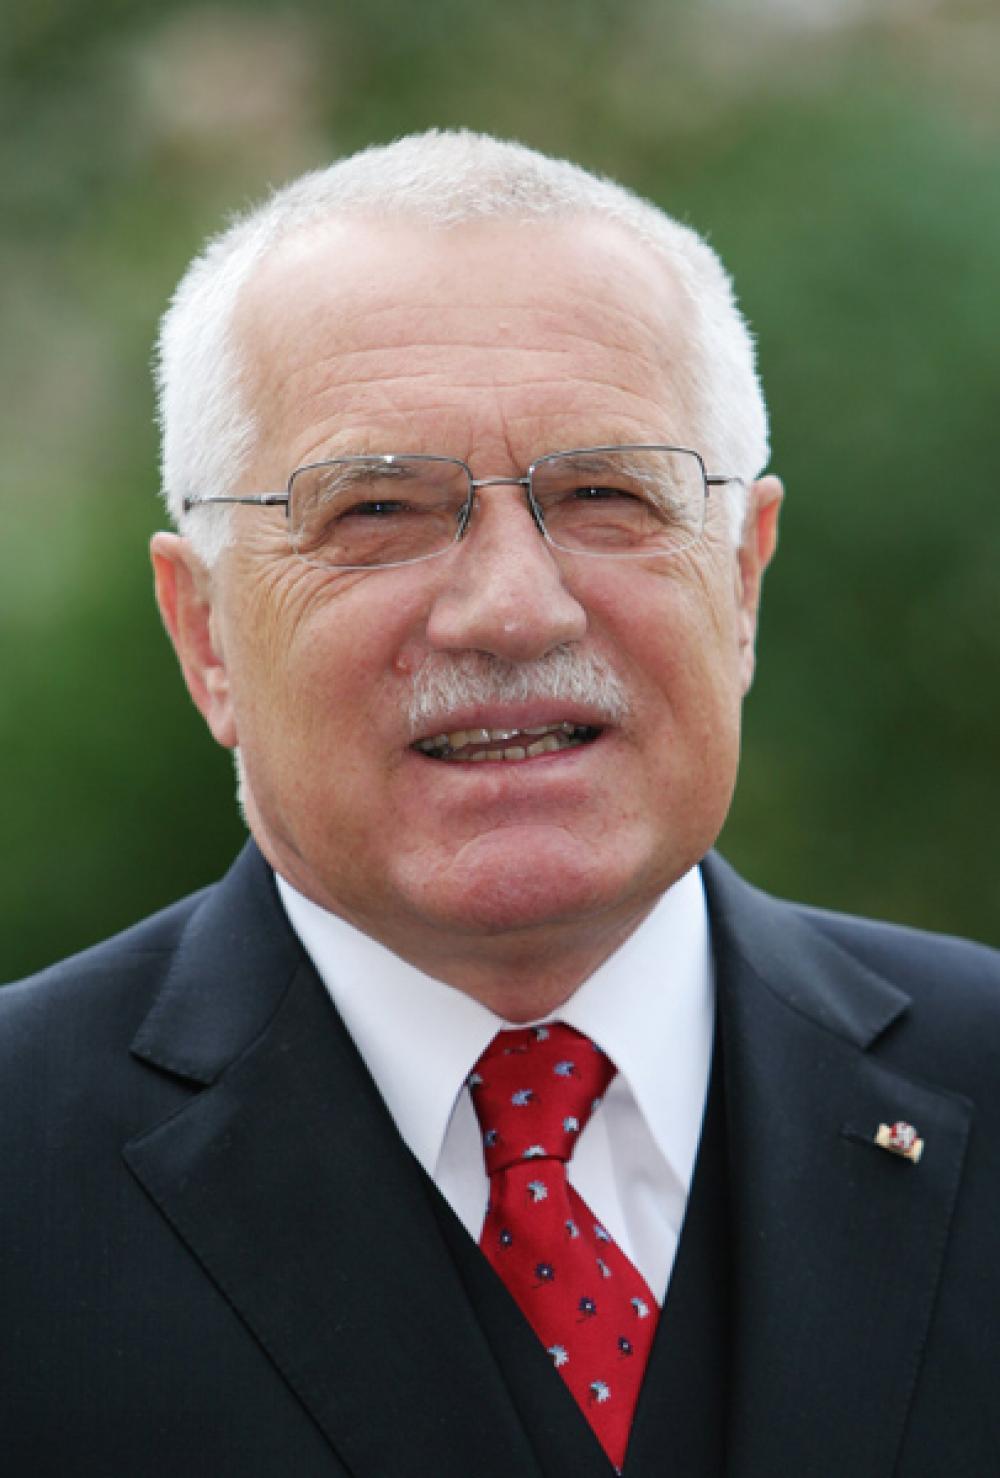 Tšekin presidentti Václav Klaus.